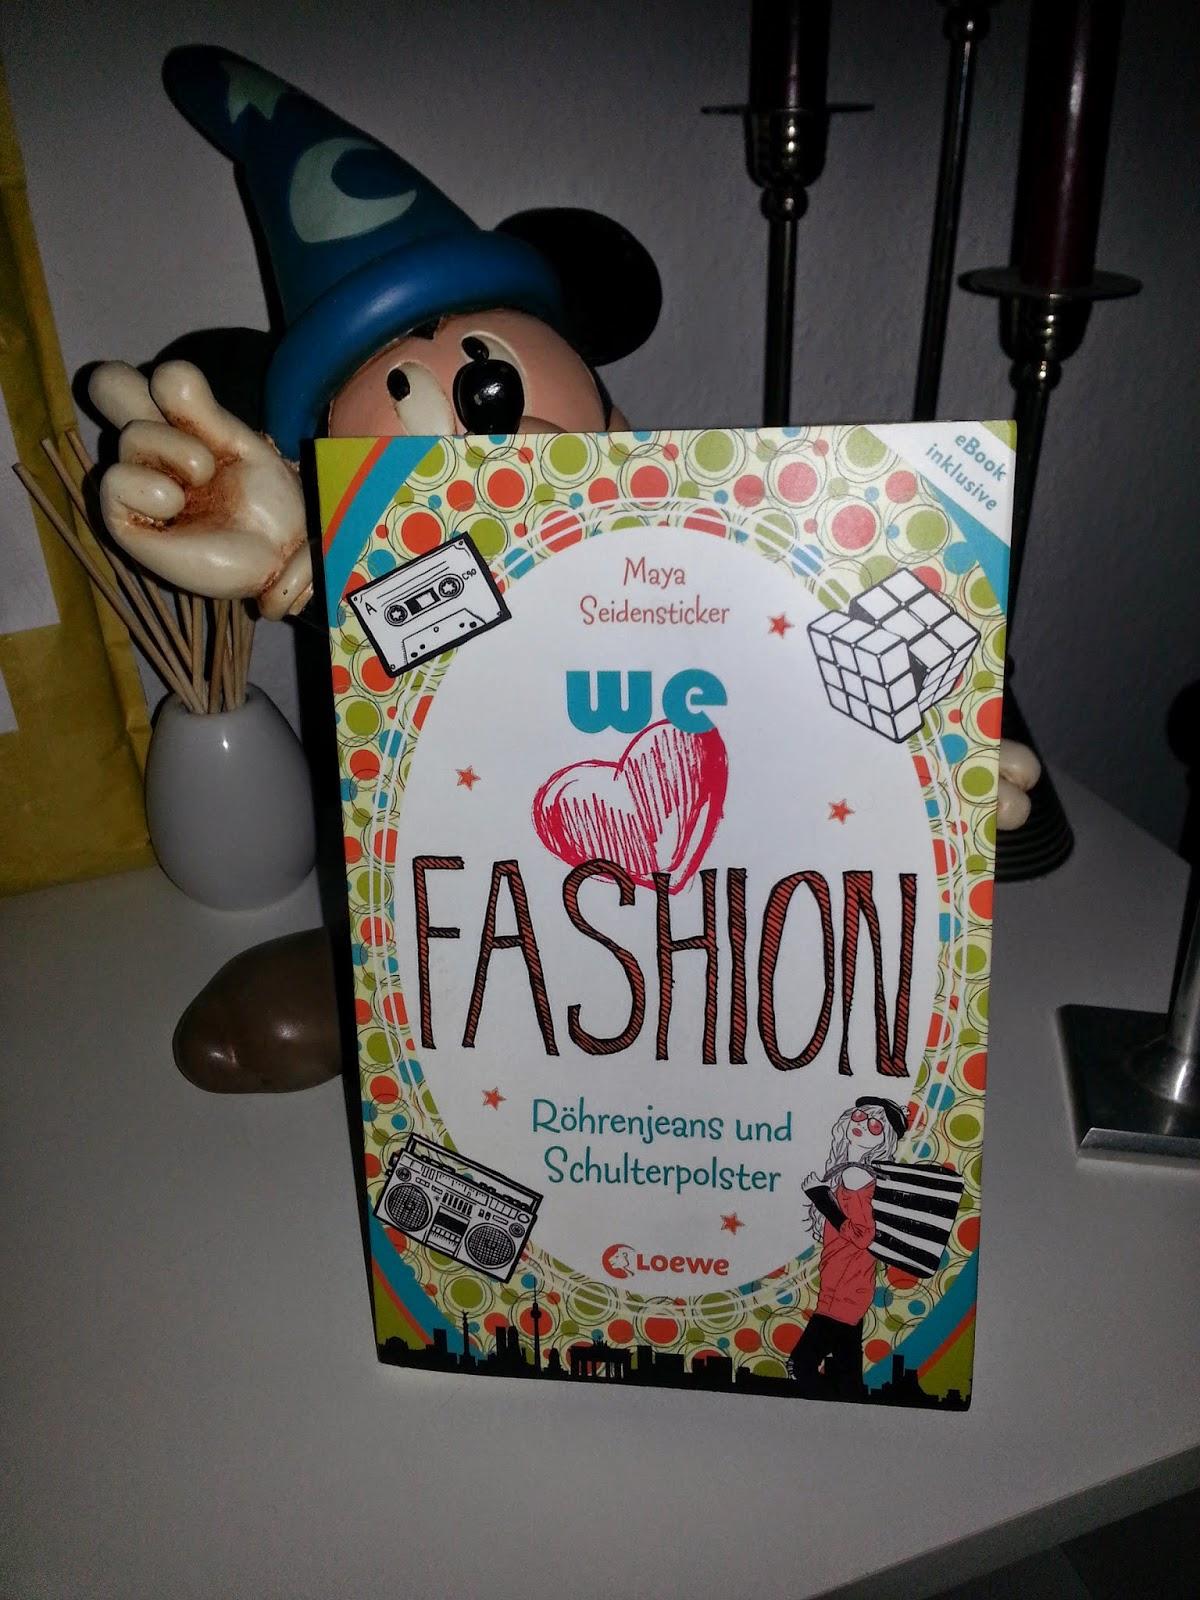 http://claudiasbuchstabenhimmel.blogspot.de/2014/06/we-love-fashion-rohrenjeans-und.html